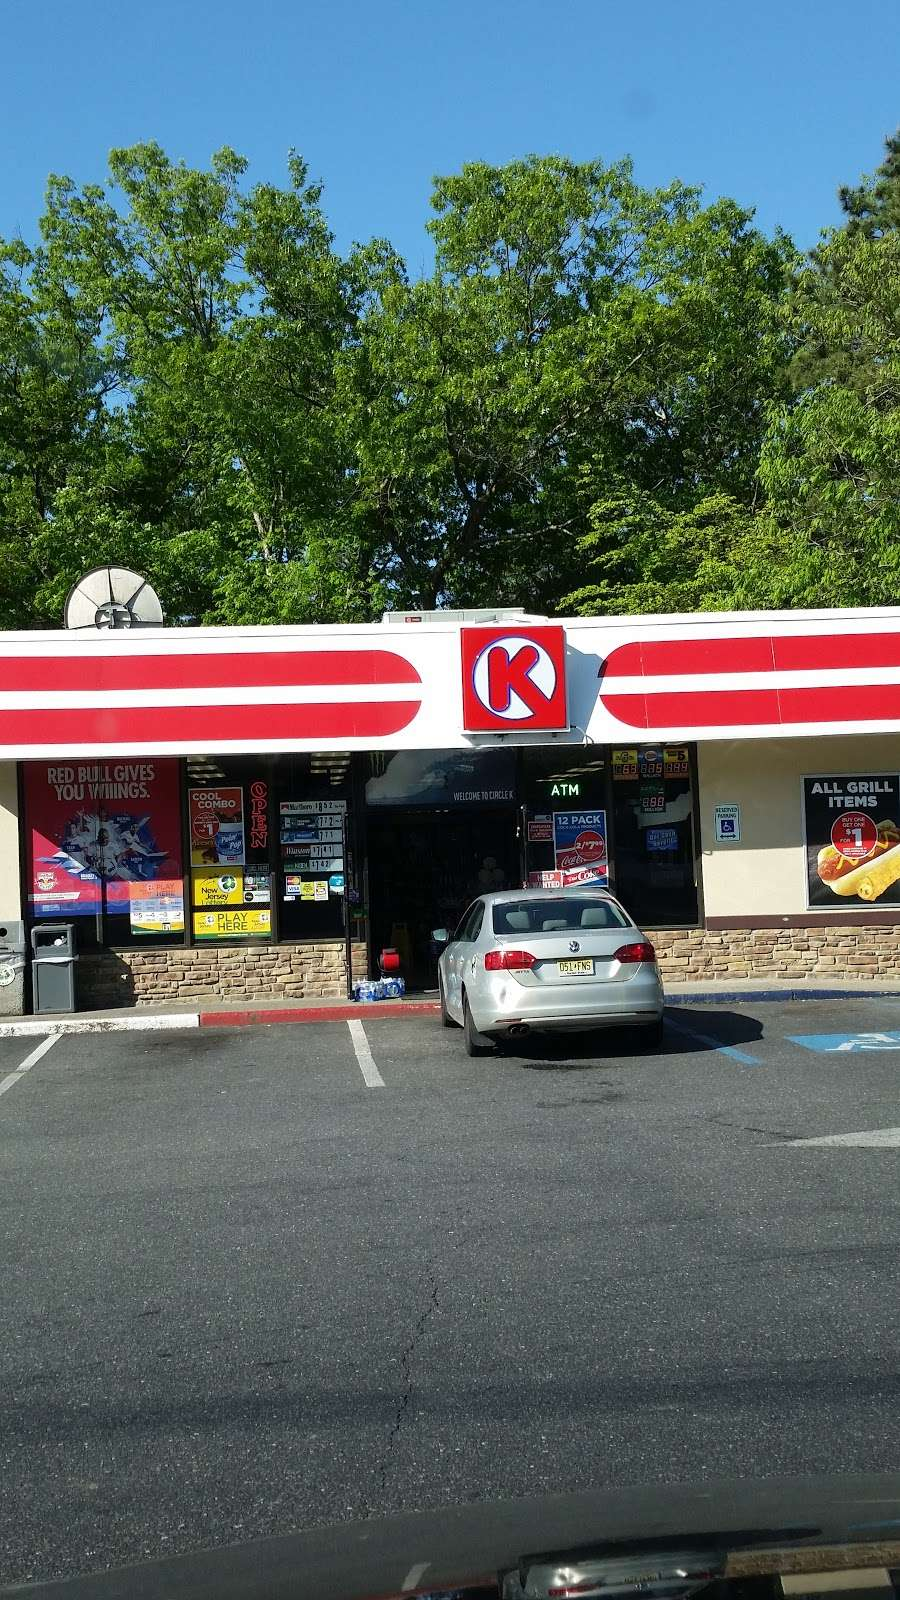 Circle K - convenience store  | Photo 1 of 2 | Address: 2001 Ridgeway Rd, Toms River, NJ 08757, USA | Phone: (732) 736-0539